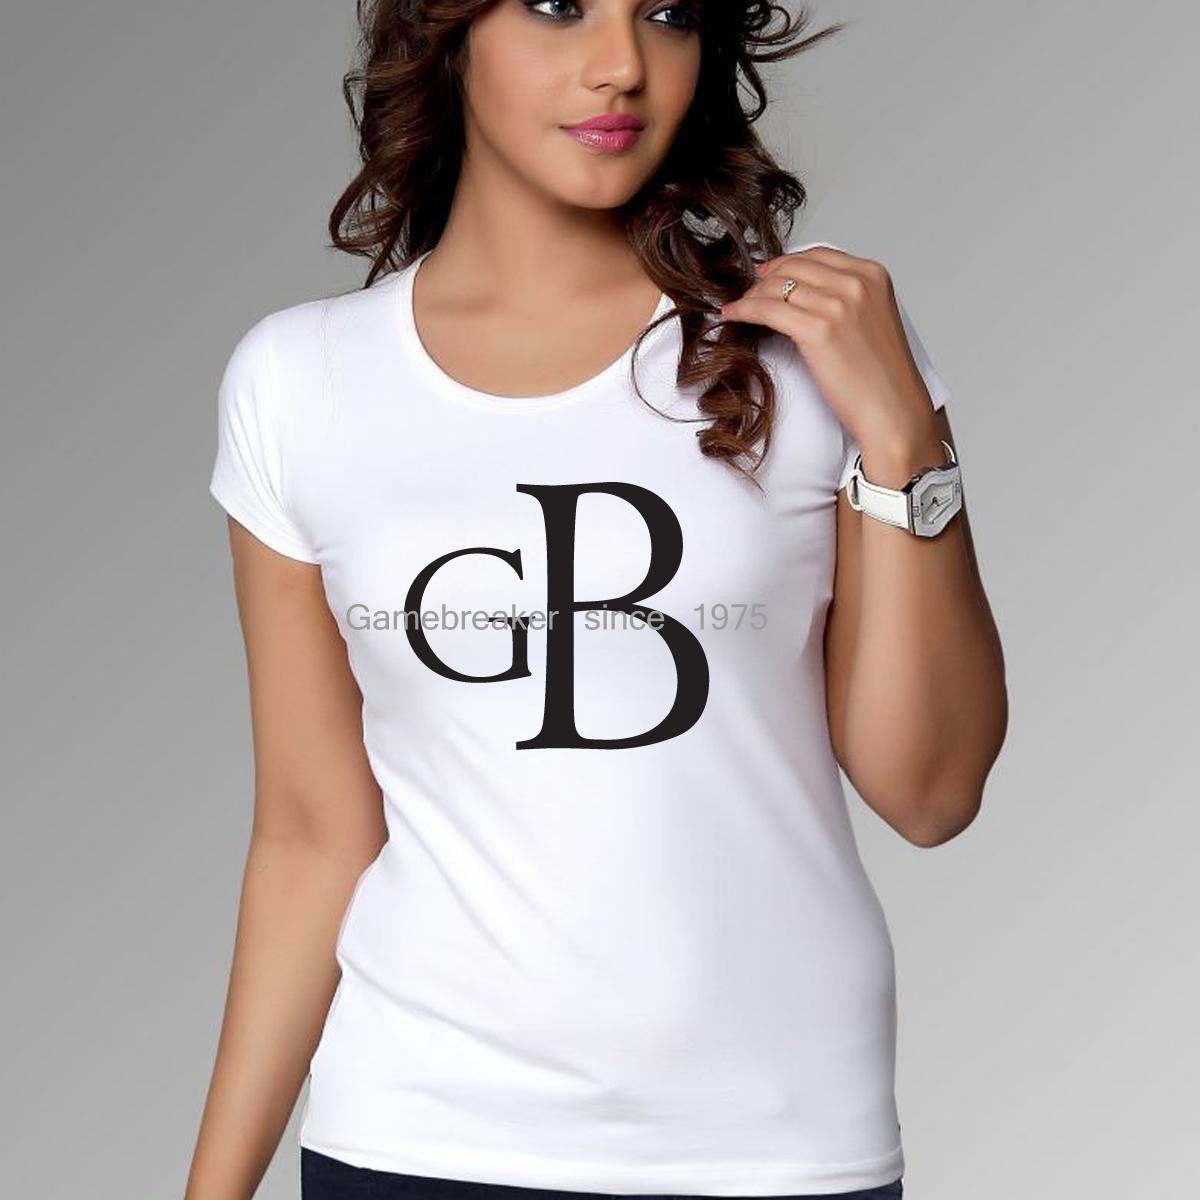 GB-GBsince75-Women.jpg